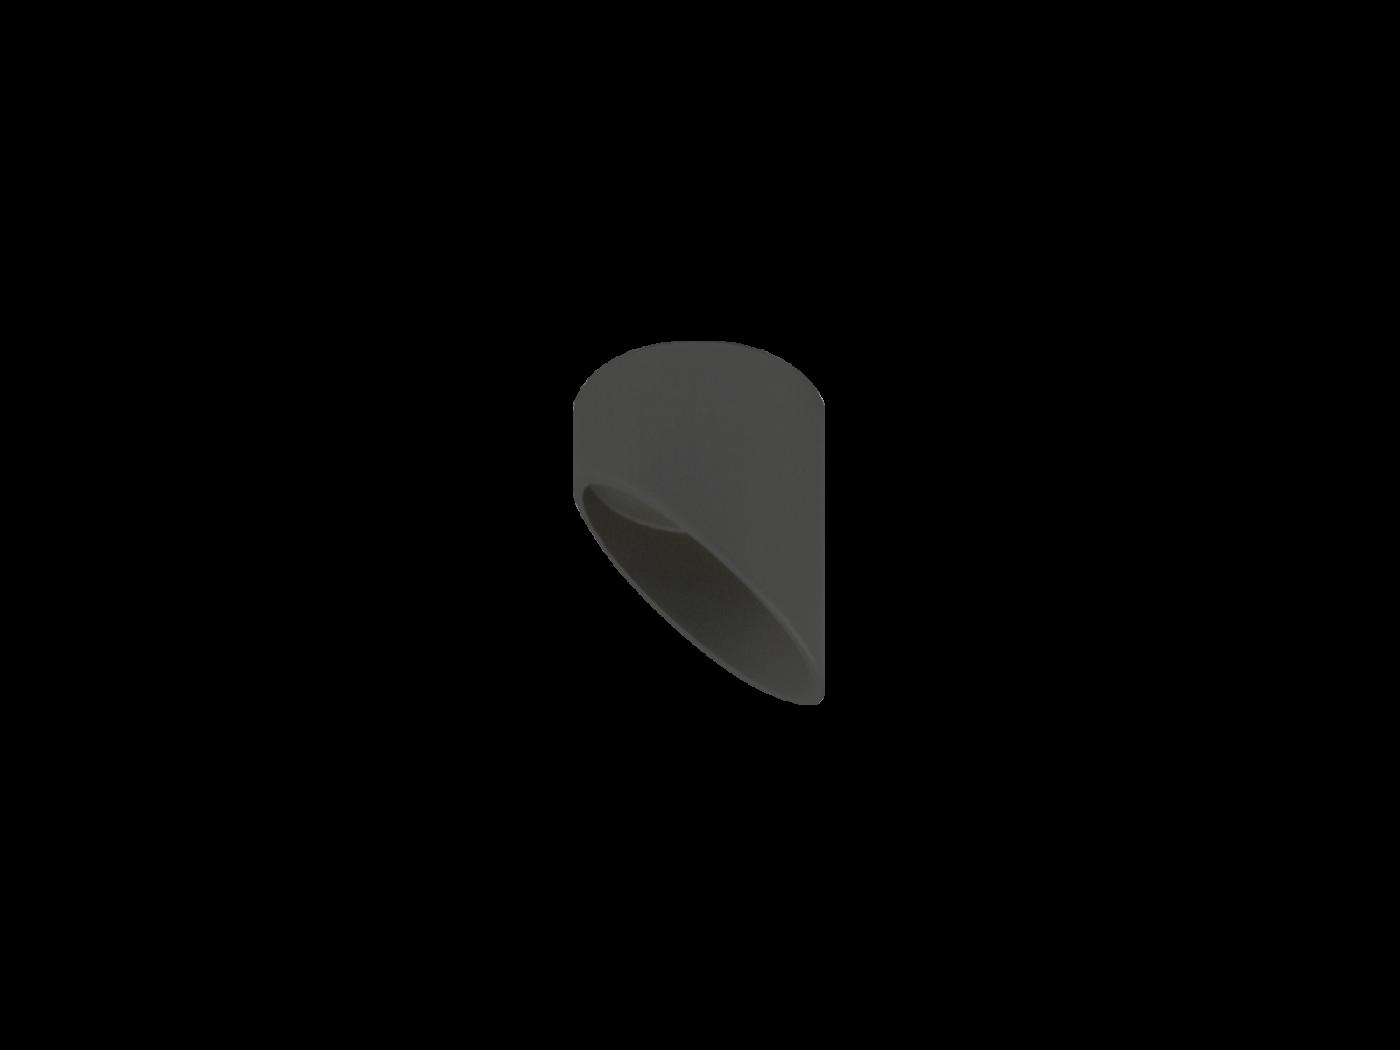 Highline_Diagonal_3K_Black_1600x1200